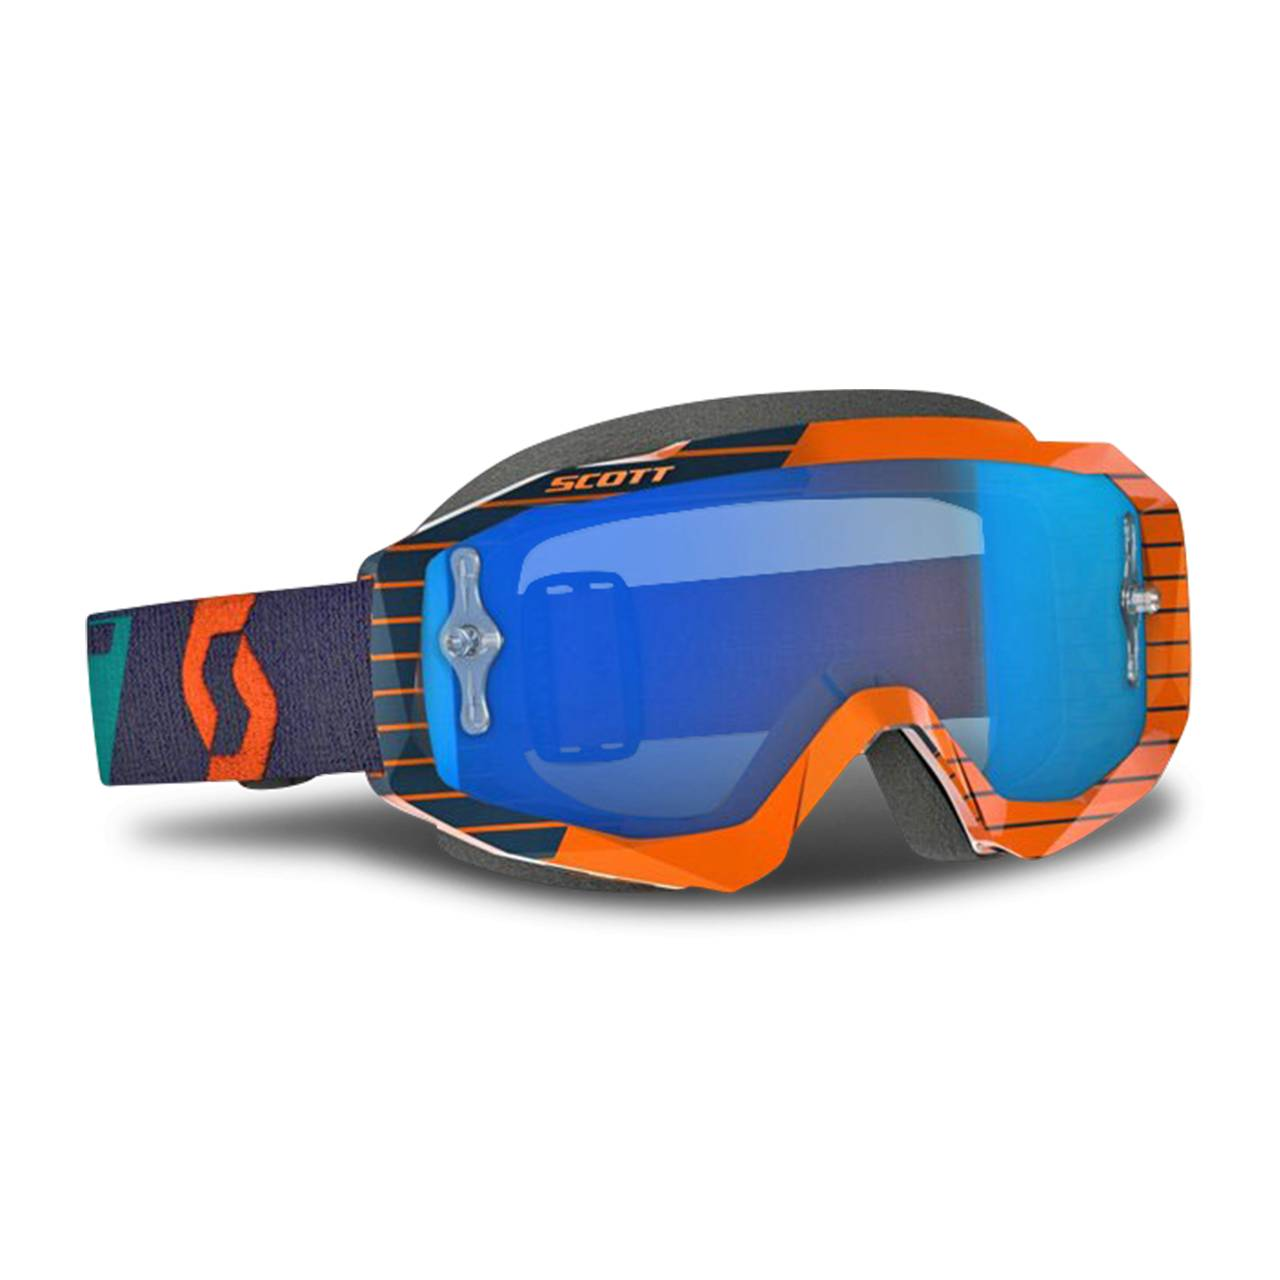 Scott Masque Cross Scott Hustle Orange-Bleu